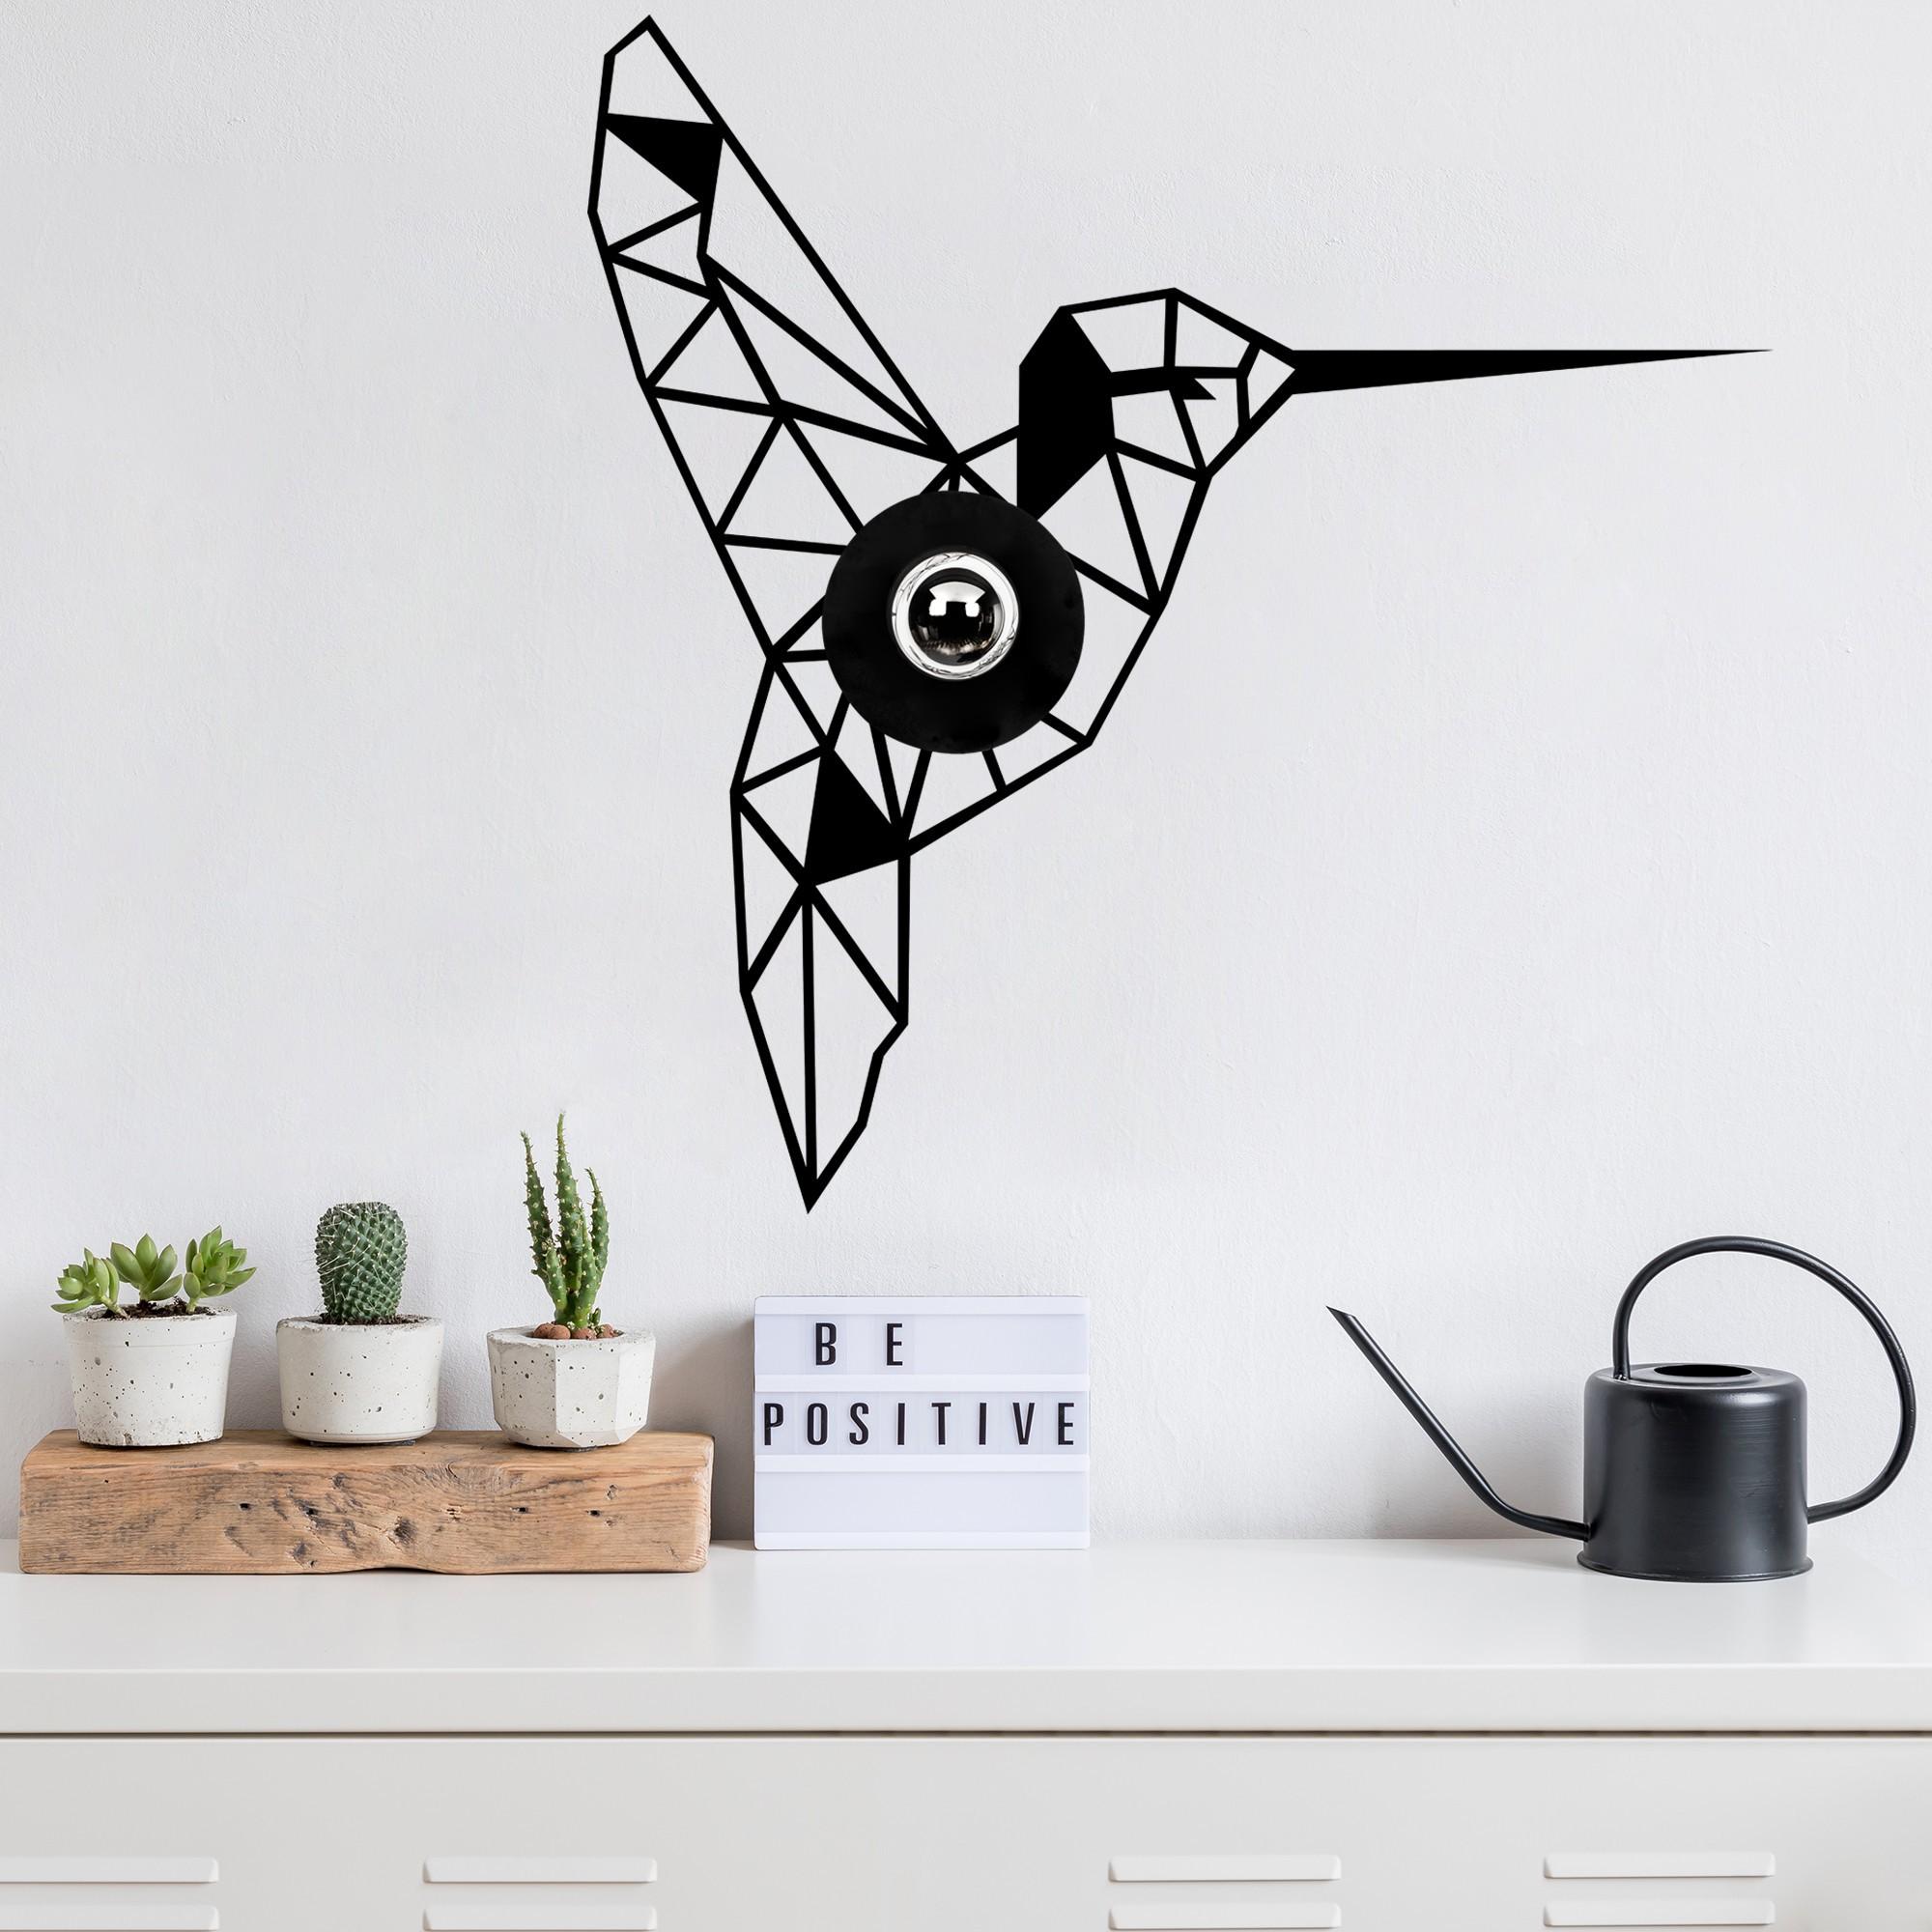 LED industriële wanddeco lamp dieren - Kolibrie - vogel - dimbaar - E27 fitting - sfeerfoto